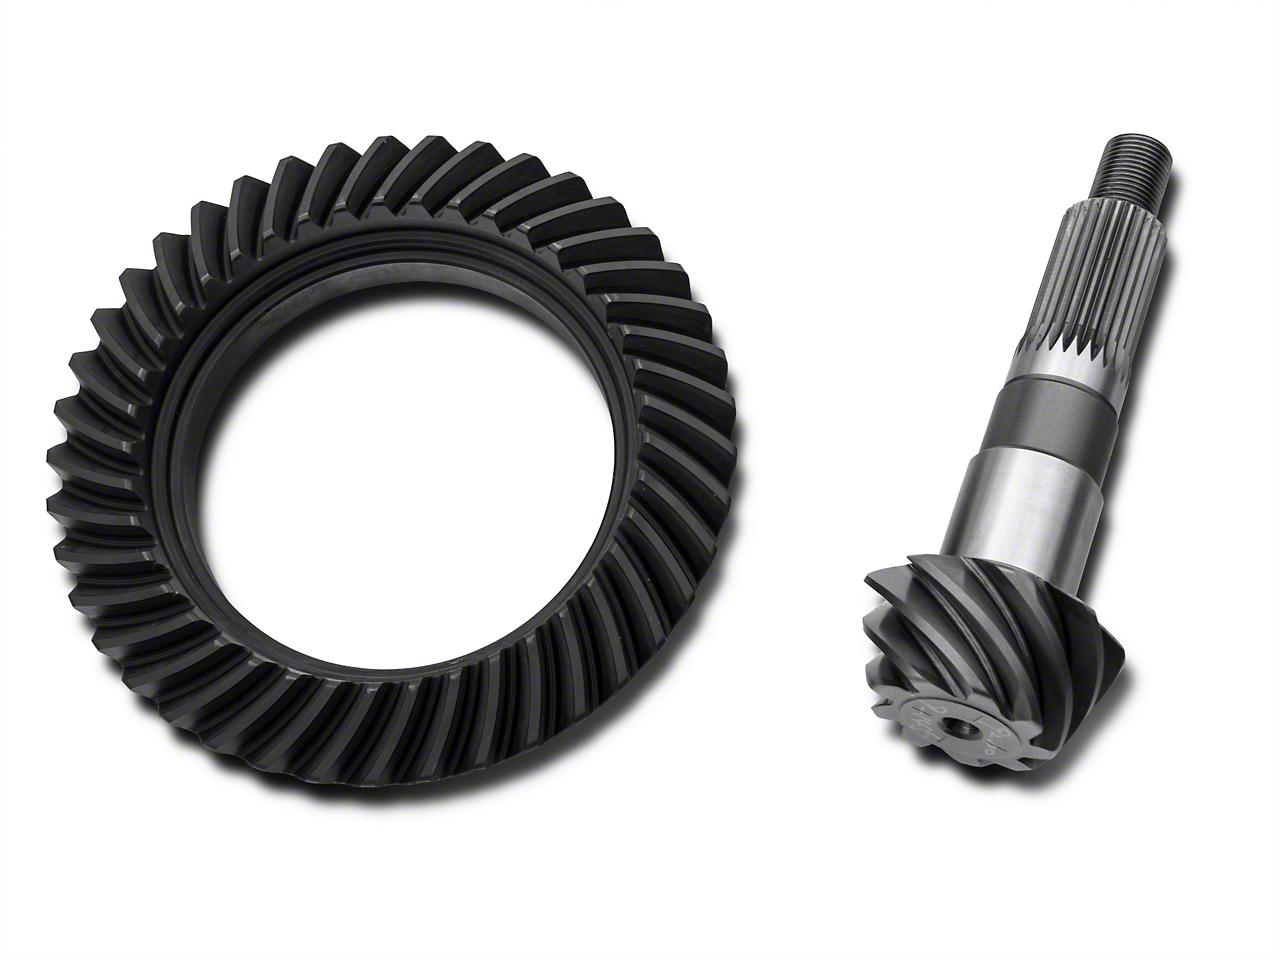 Yukon Gear Dana 30 Front Ring Gear and Pinion Kit - 4.56 Gears (97-06 Jeep Wrangler TJ)